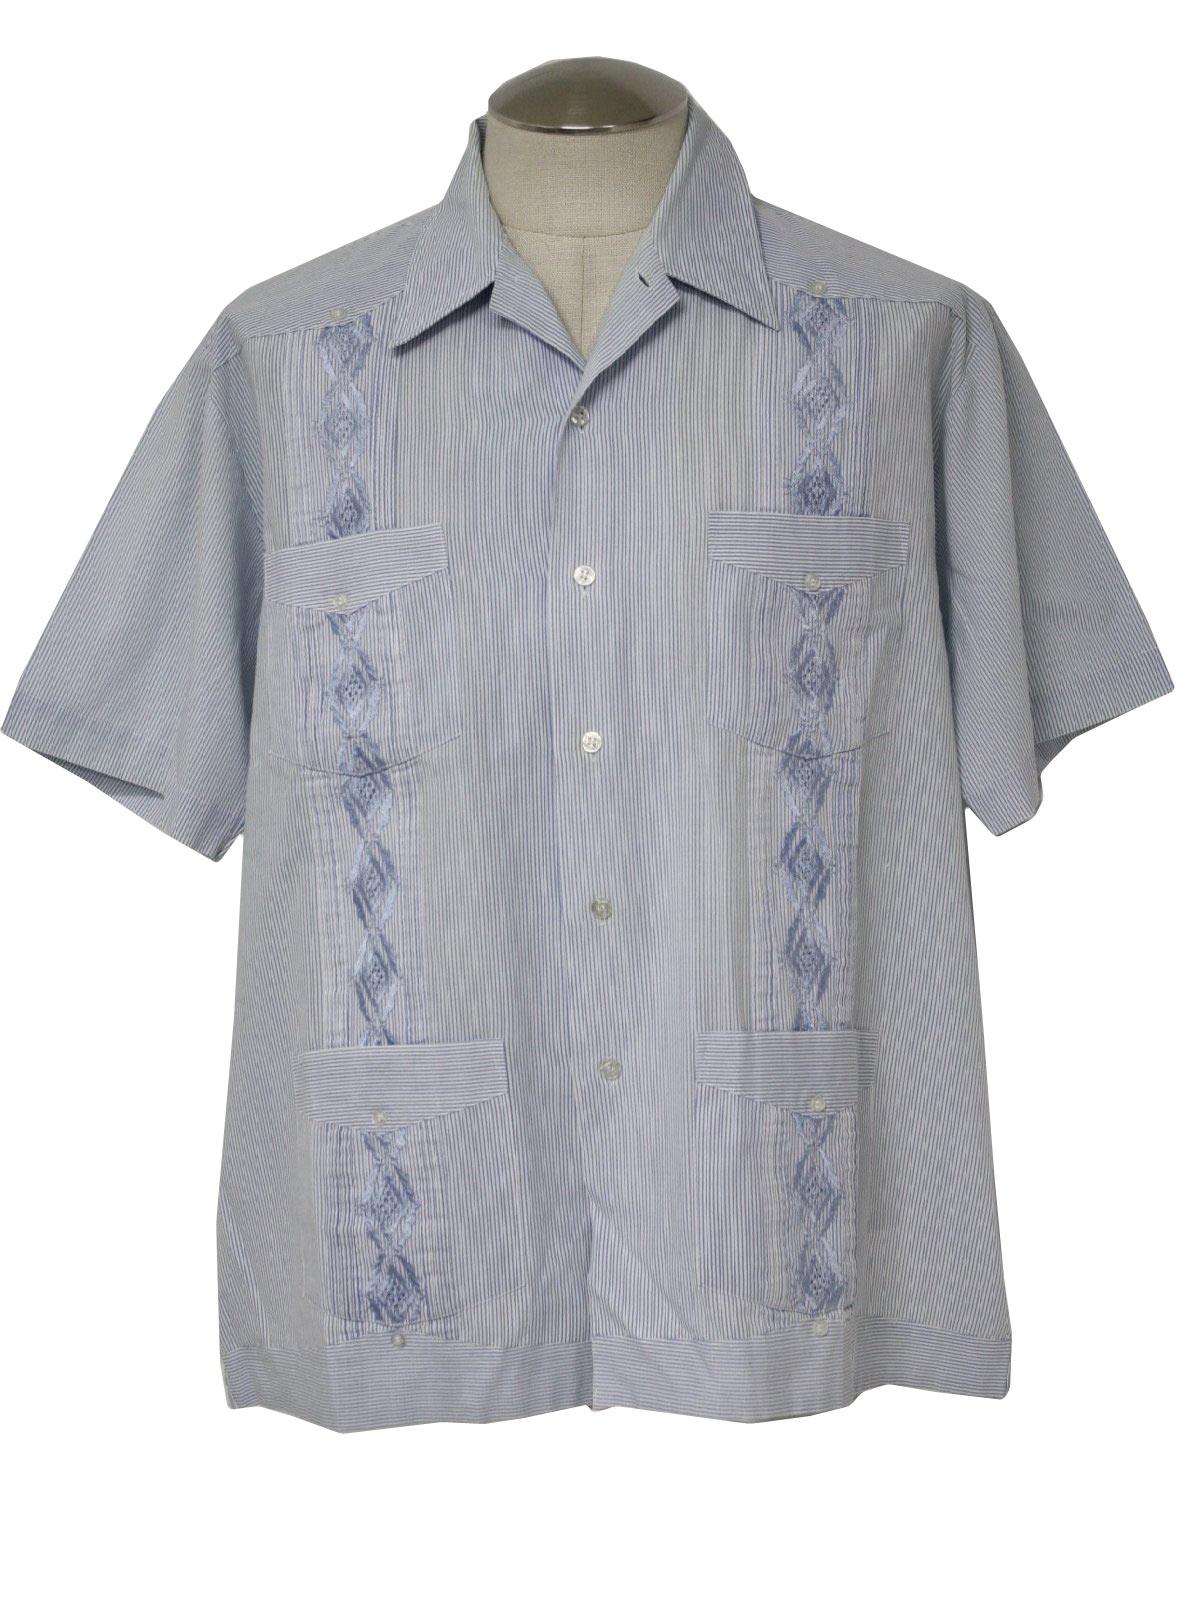 Womens Short Sleeve Shirts